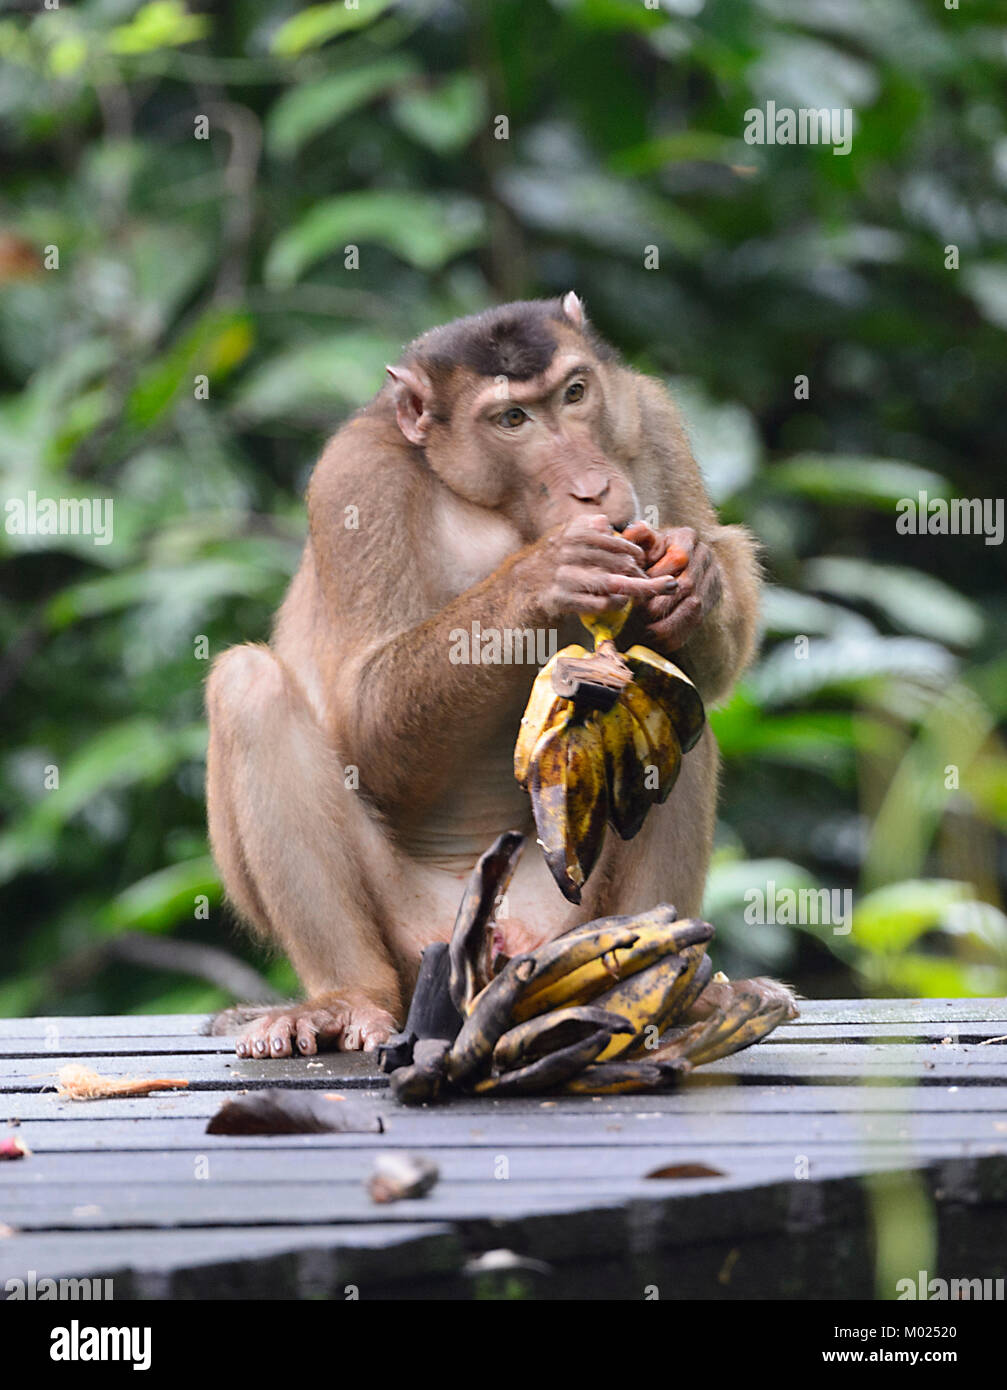 Southern Pig-tailed Macaque (Macaca nemestrina) eating bananas, Sepilok Orangutan Rehabilitation Centre, Borneo, - Stock Image